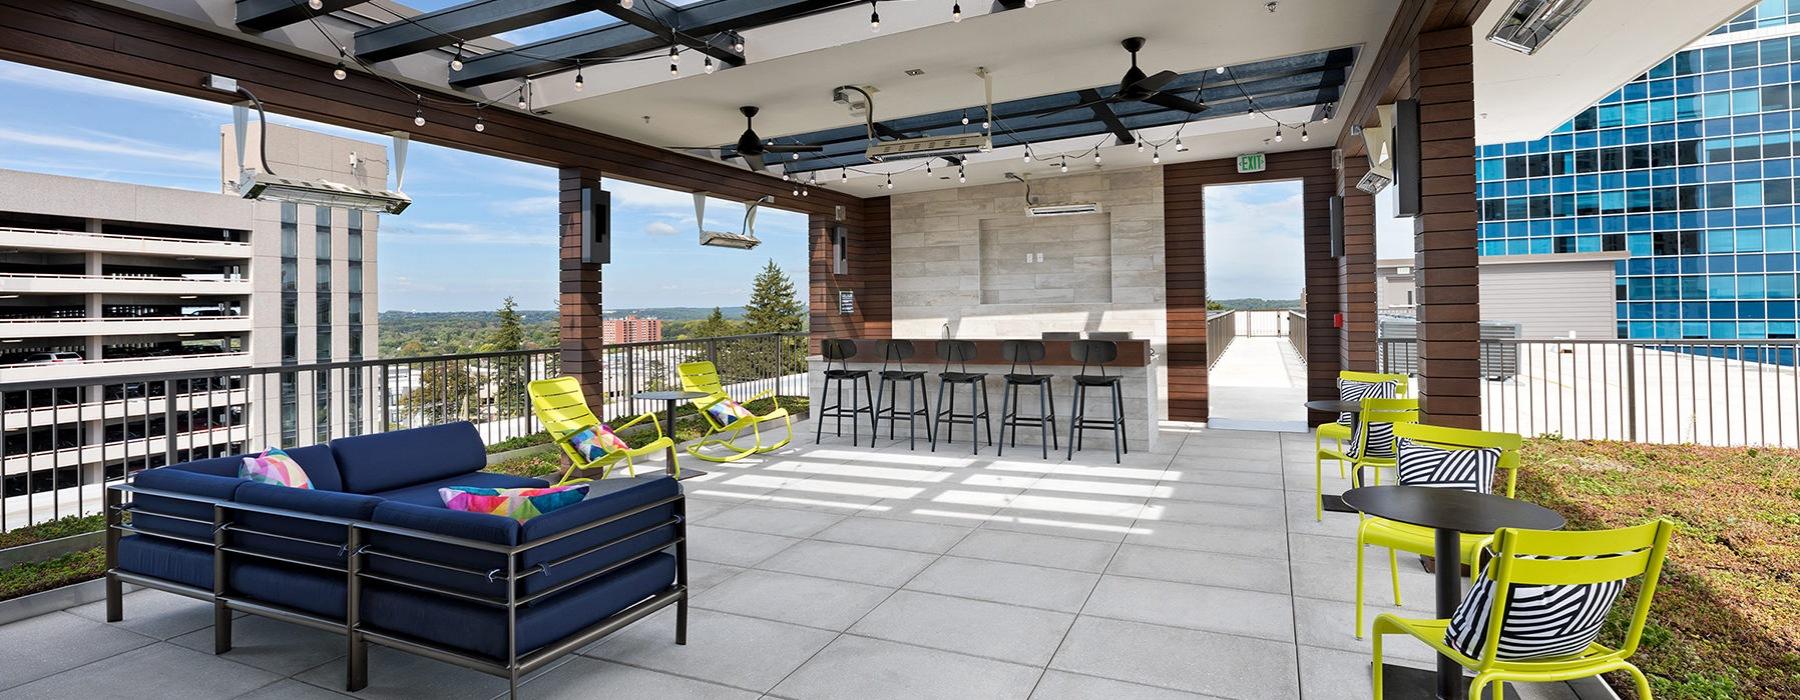 roof top sky lounge